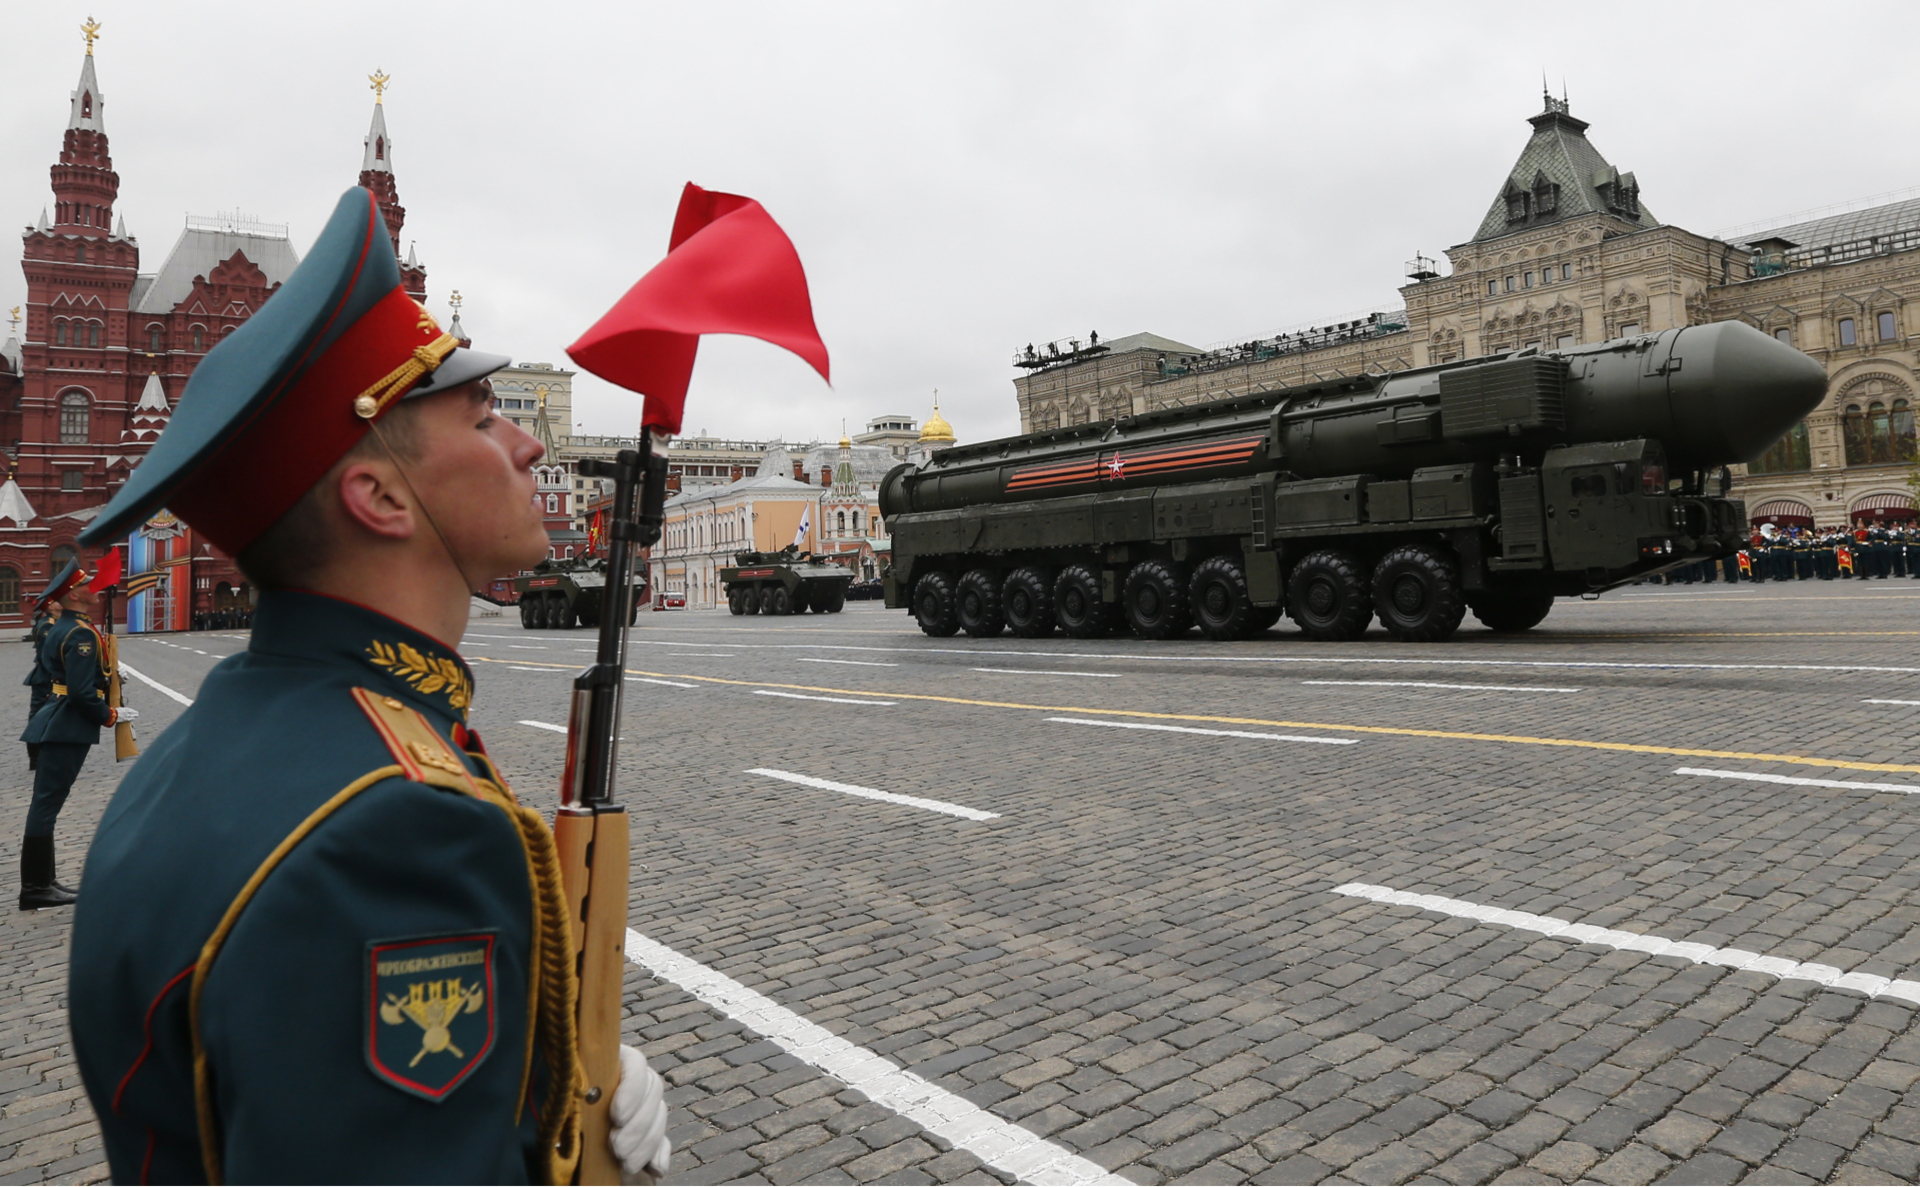 Фото: Yuri Kochetkov / Reuters